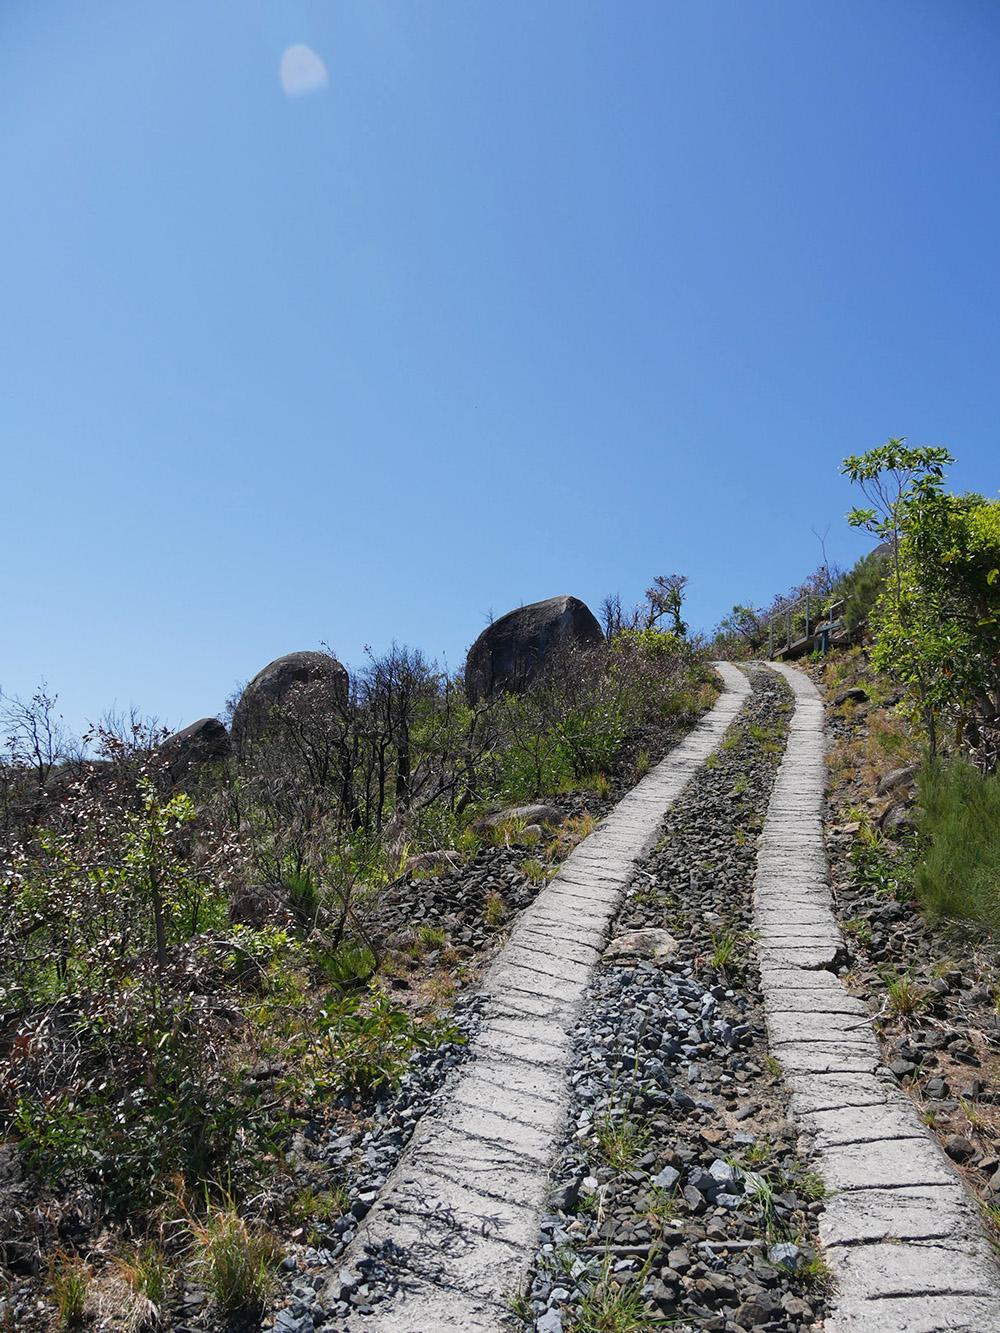 A hike with a big challenge